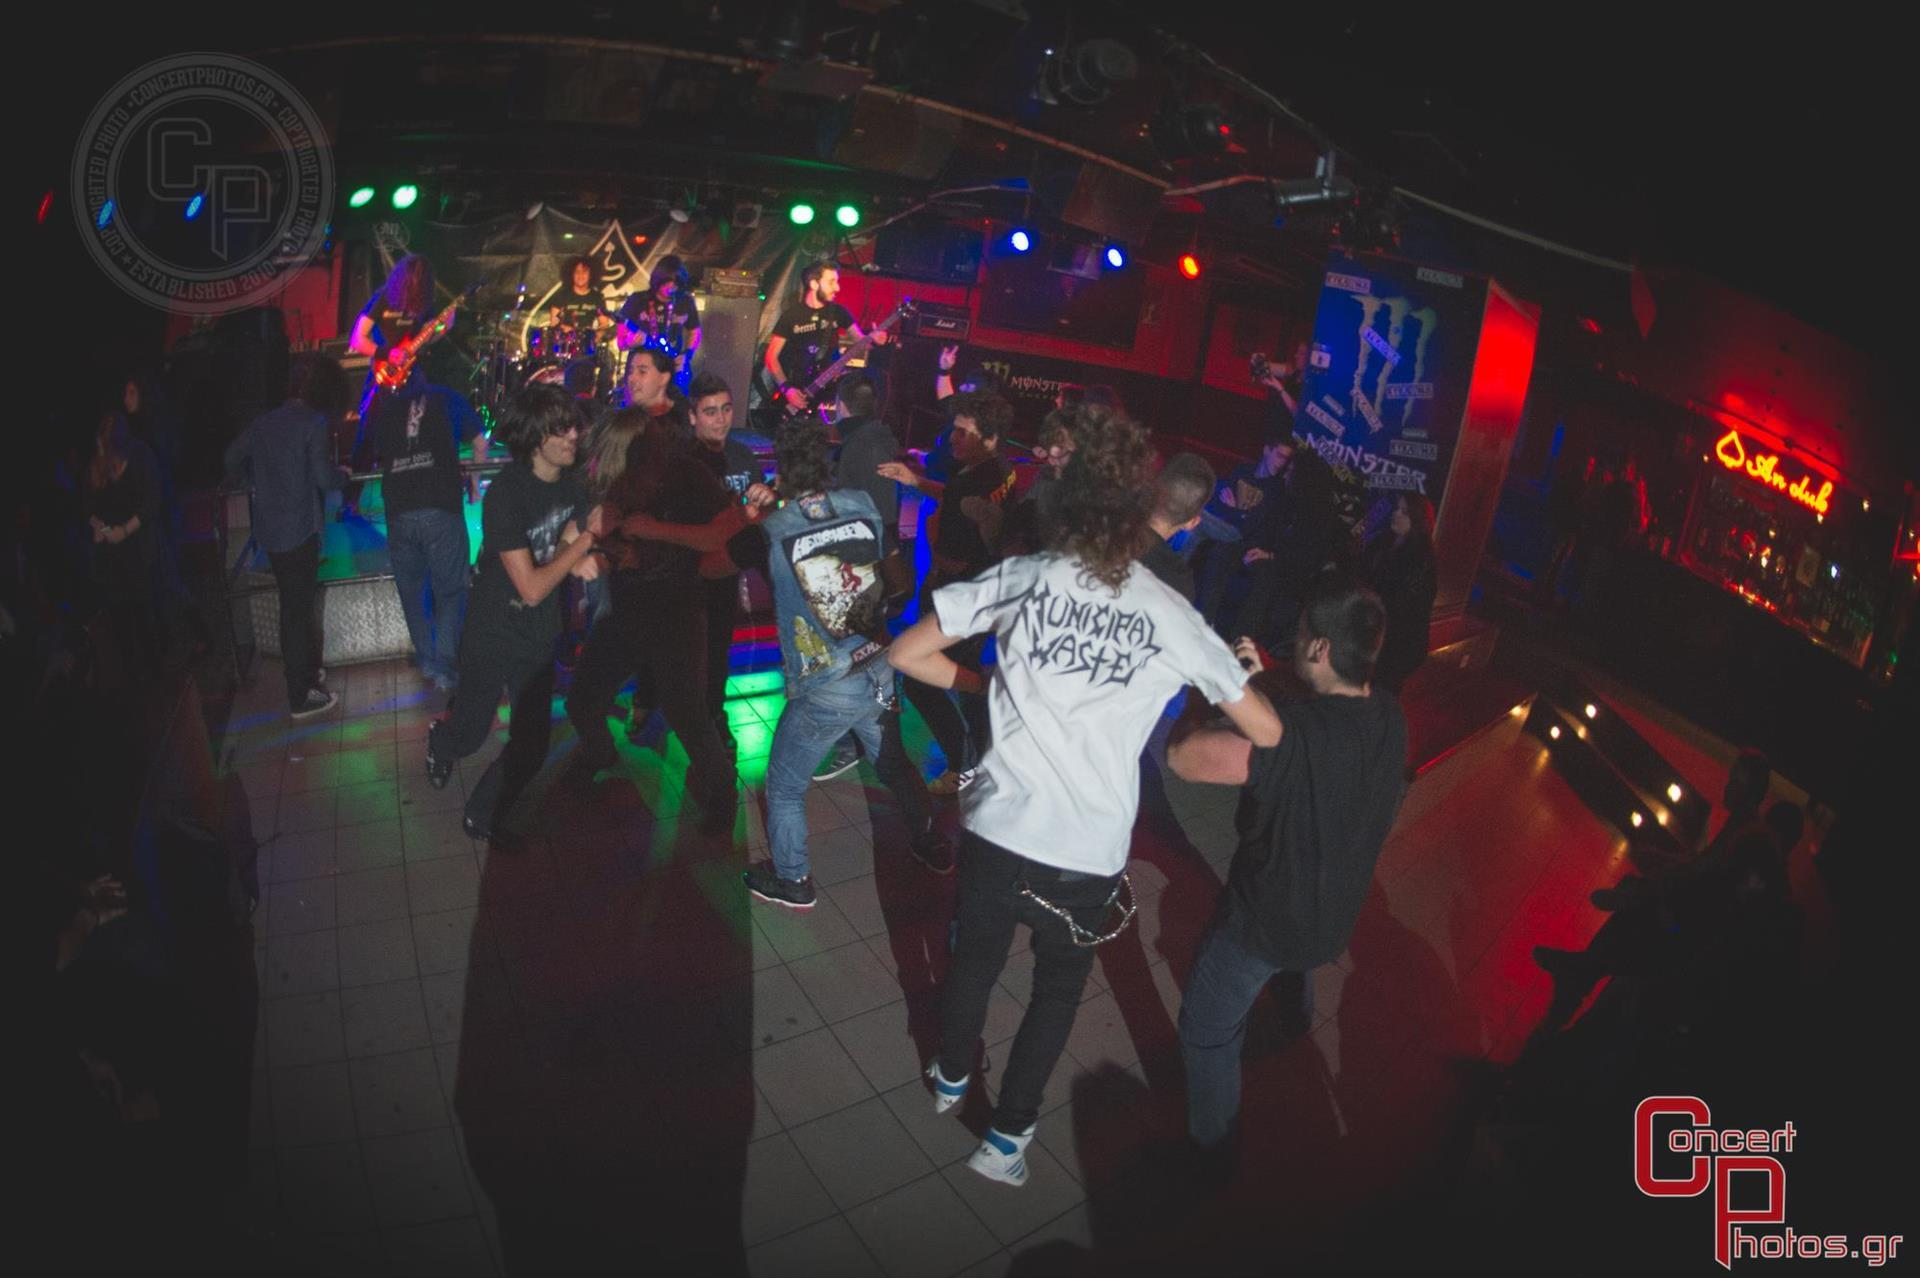 Battle Of The Bands Athens - Leg 3- photographer:  - ConcertPhotos - 20150104_2325_19